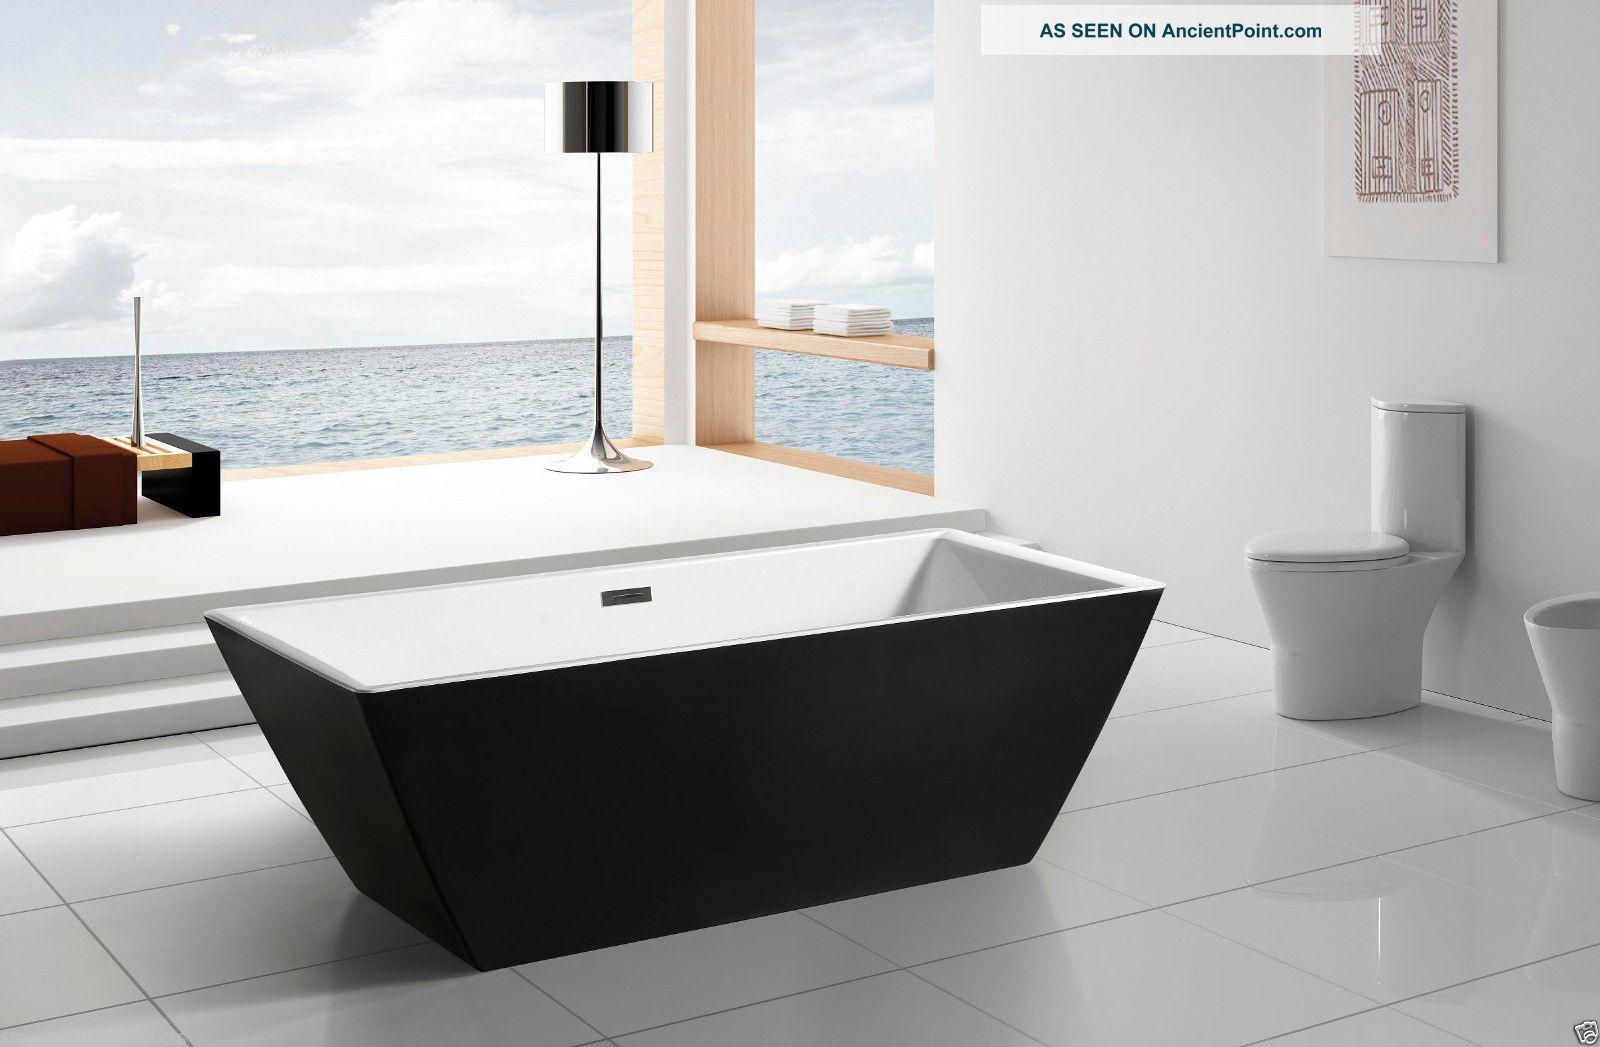 Aquapat Avalon Modern Acrylic Black Freestanding Soaking Bathtub Spa 126813 - B Bath Tubs photo